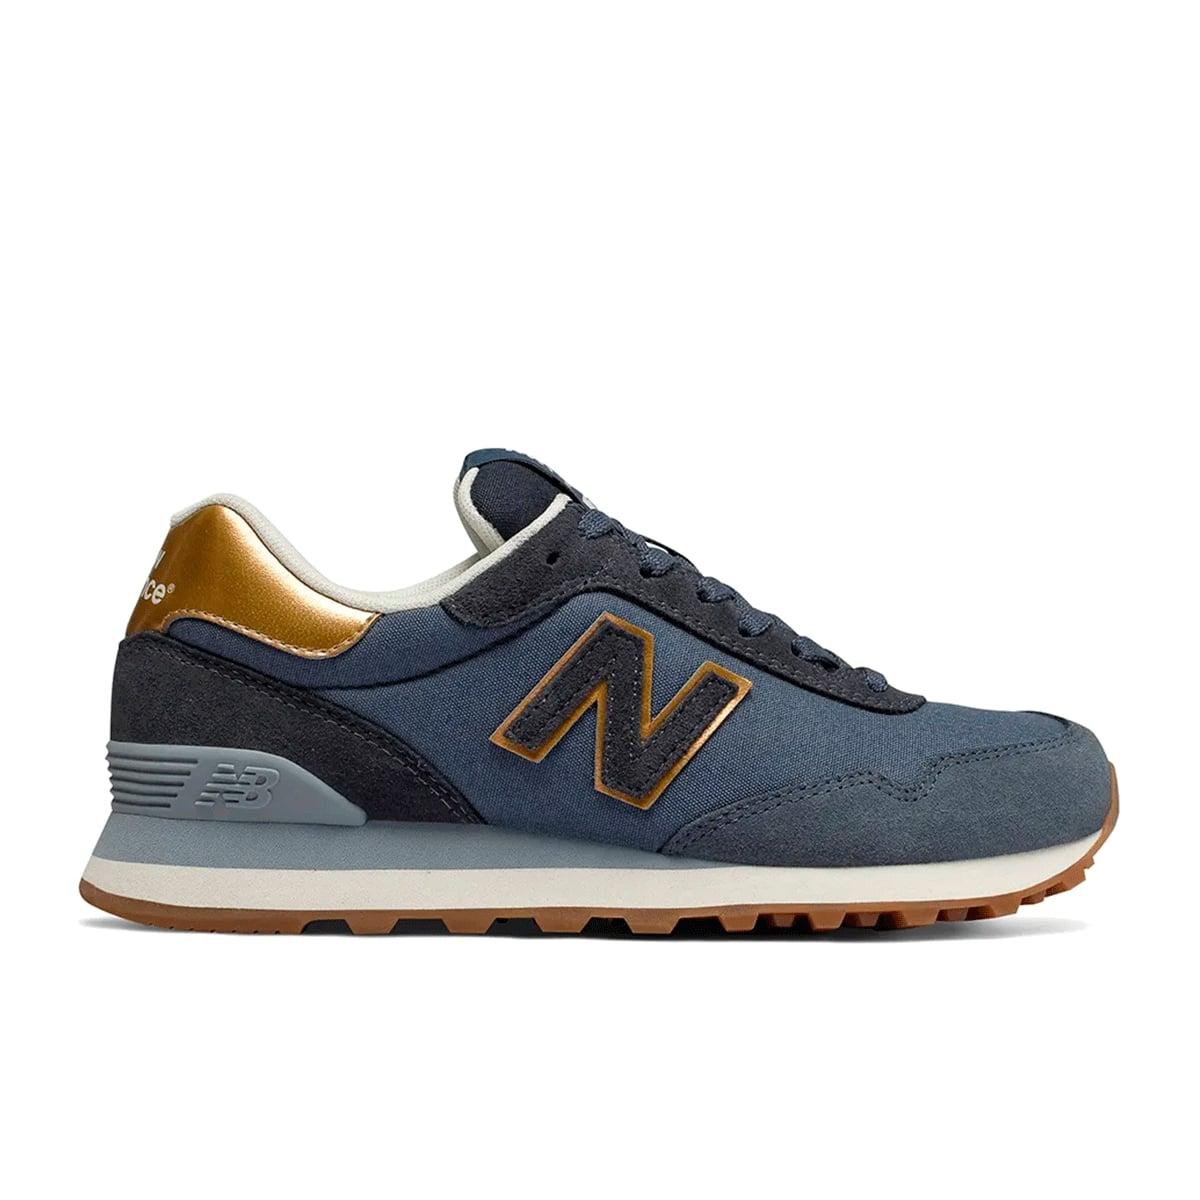 Tênis New Balance 515 Feminino Azul